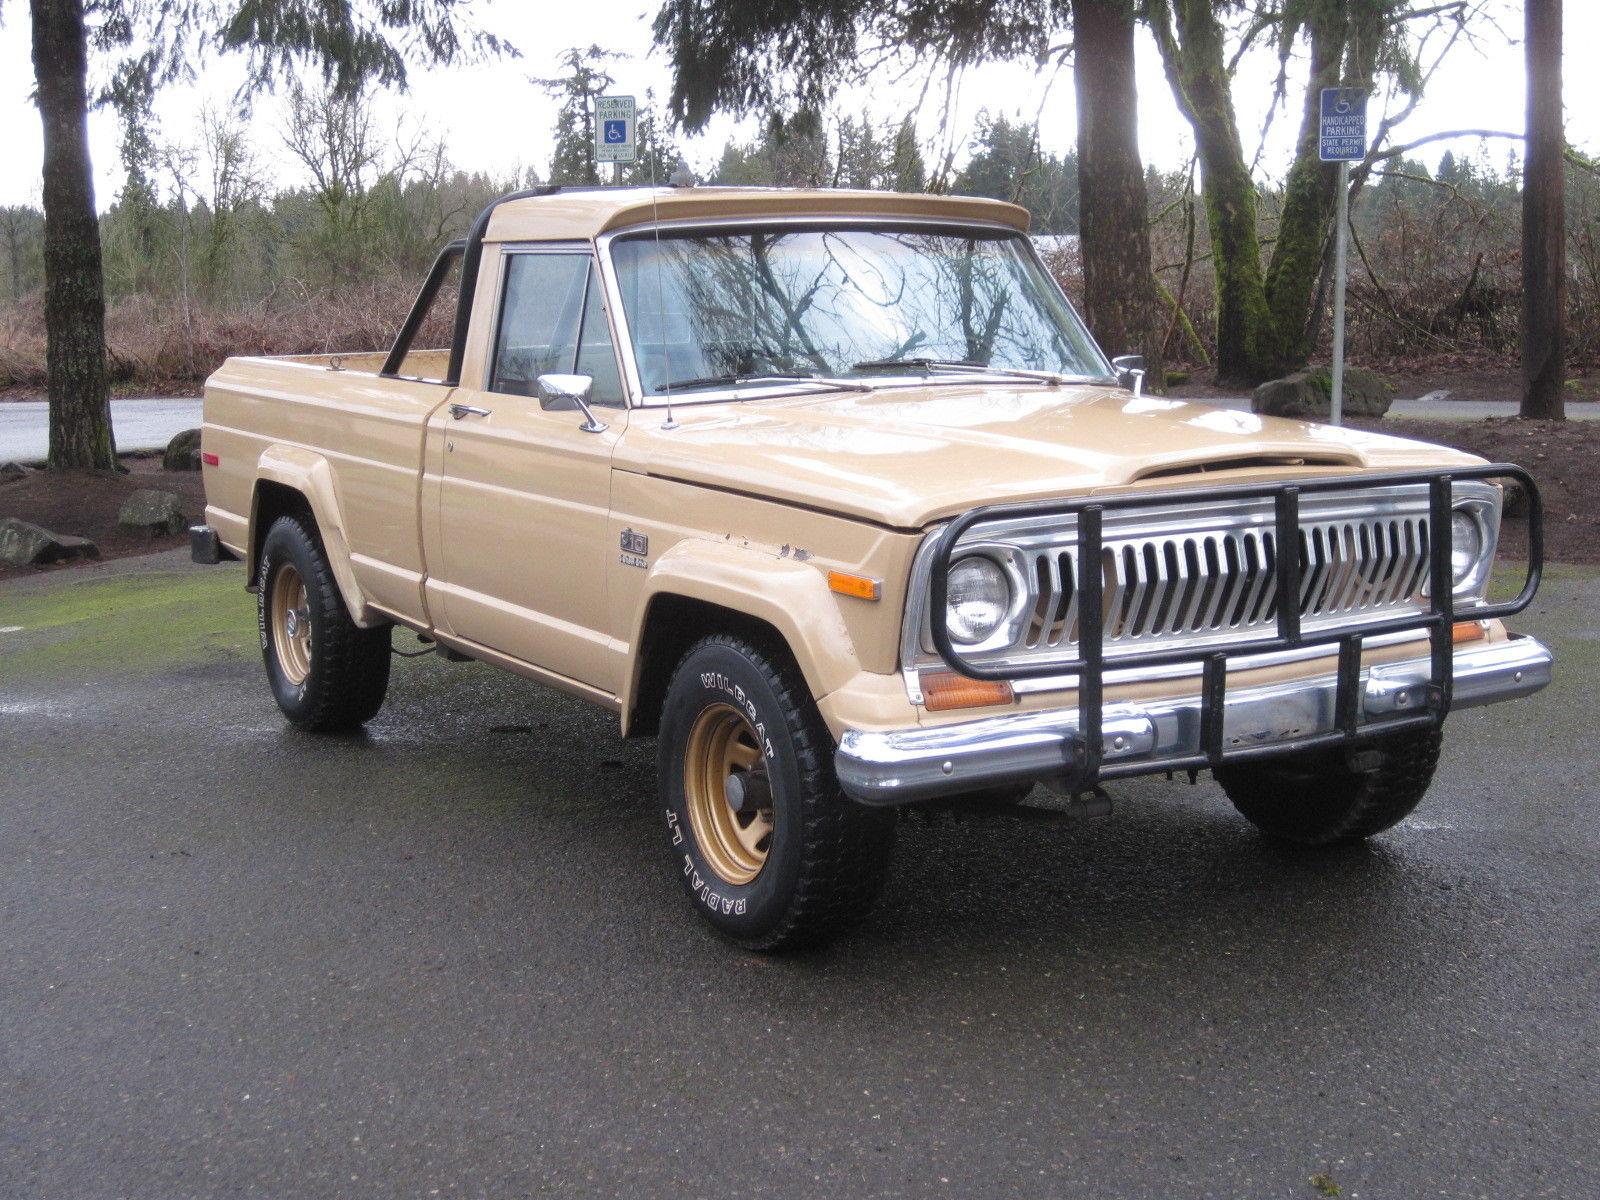 jeep 1978 j10 j 10 golden eagle 401 shortbed 4x4 rust free original truck levi 39 s classic jeep. Black Bedroom Furniture Sets. Home Design Ideas